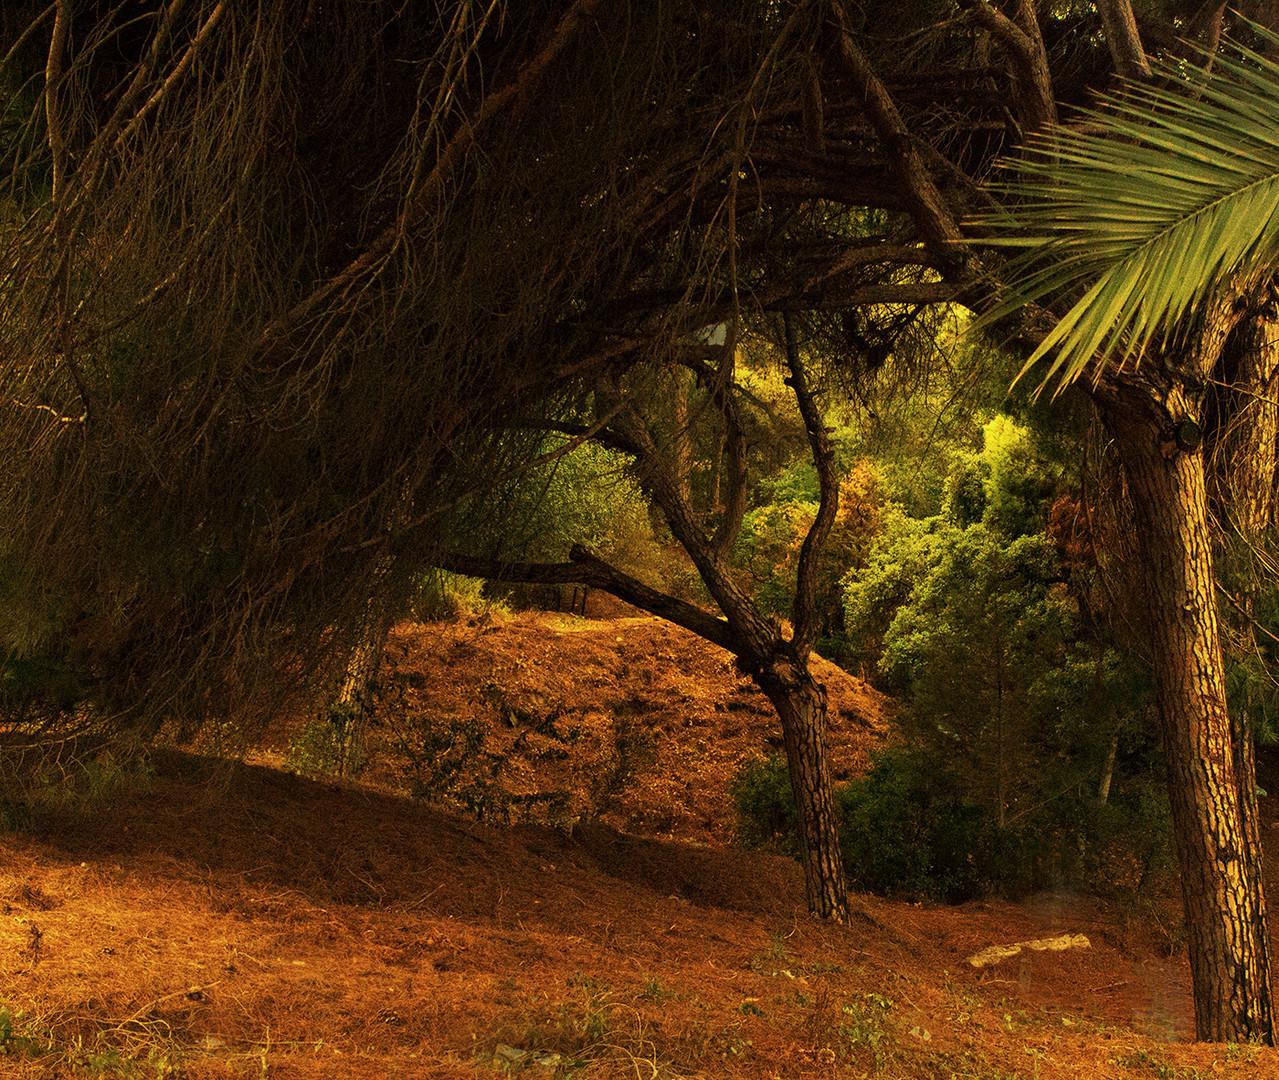 Unterholz im Urwald in Andalusien